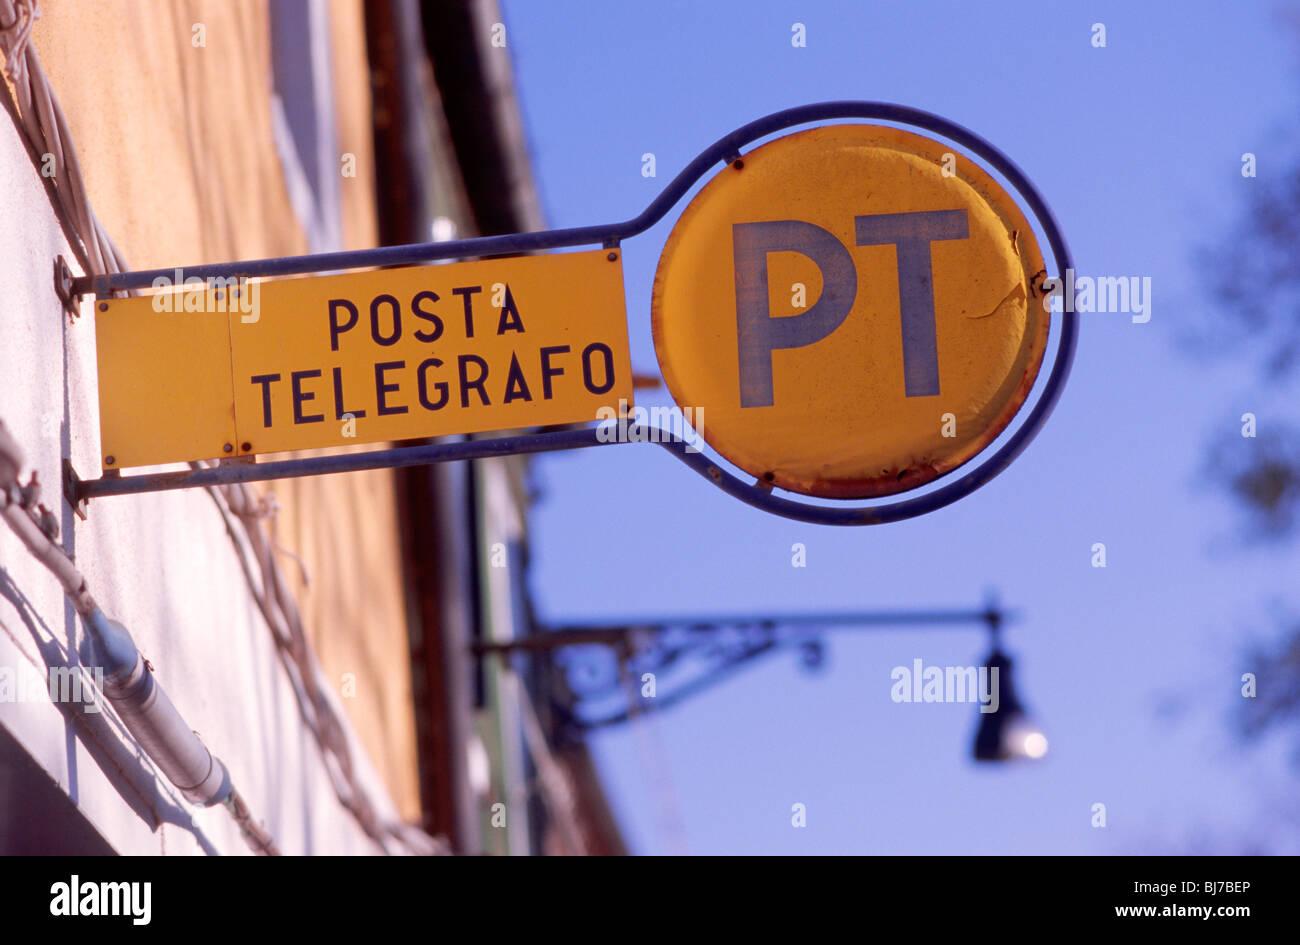 Venice, March 2008 -- Italian postal service sign 'Posta Telegrafo' on Burano, an island in the Venetian - Stock Image